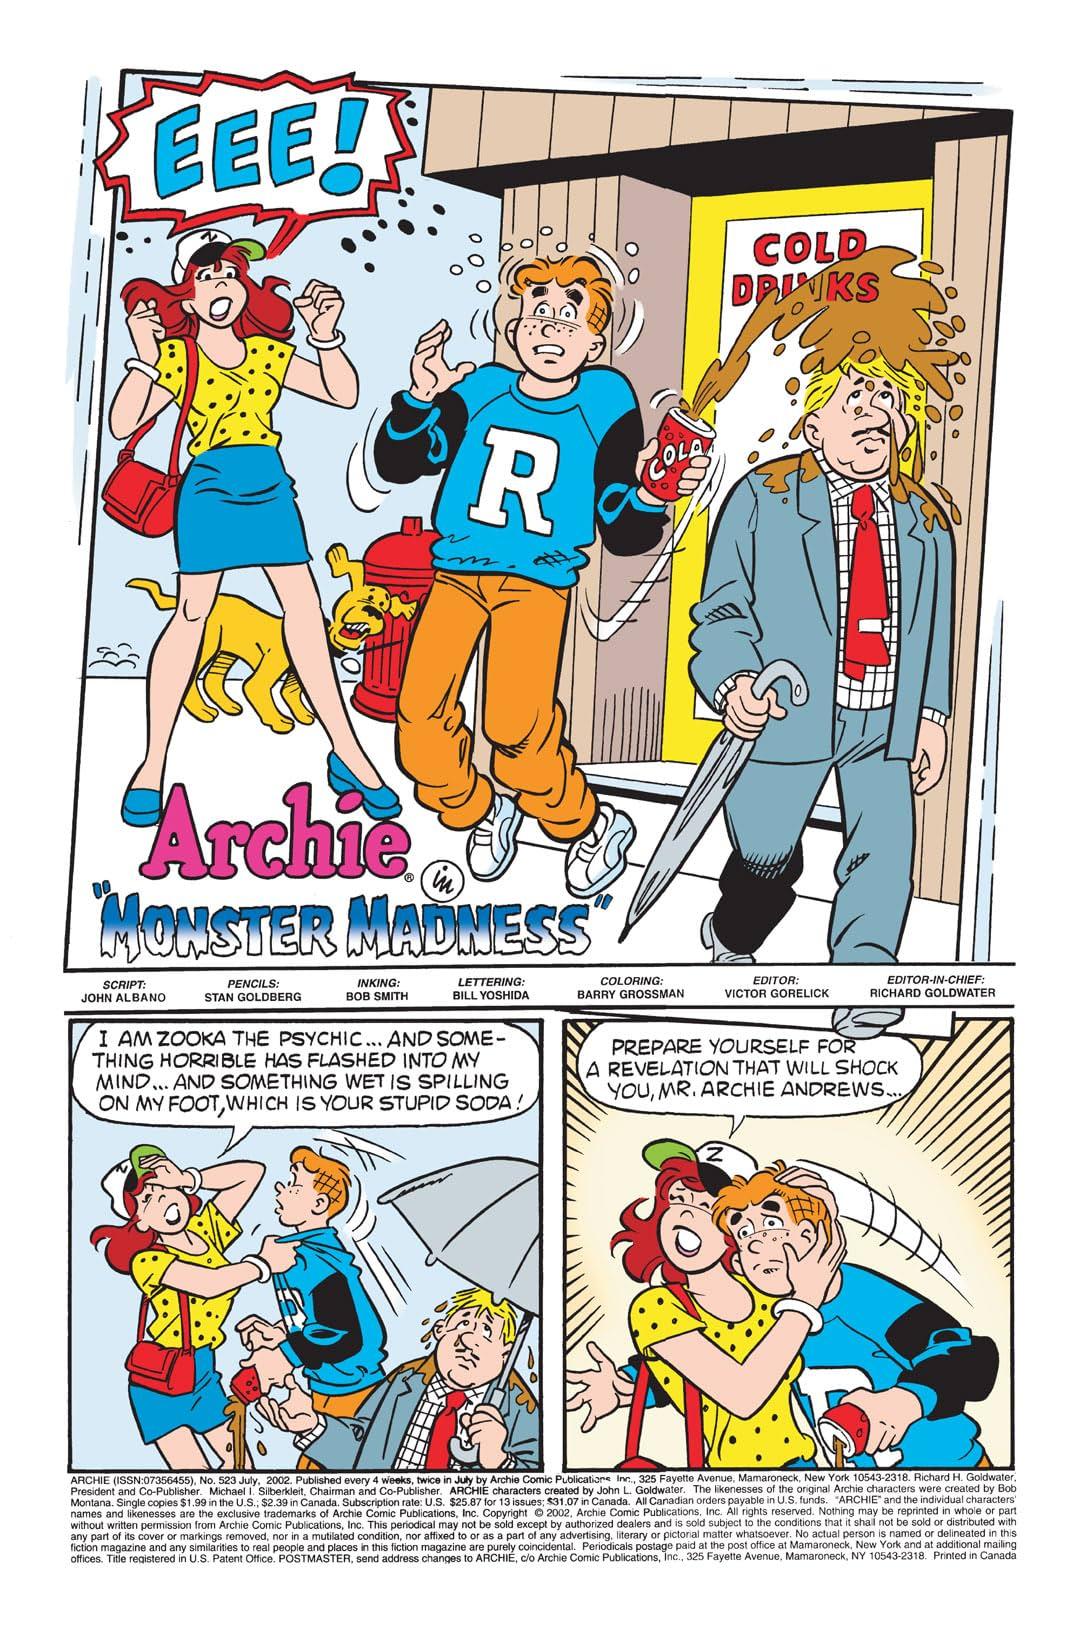 Archie #523